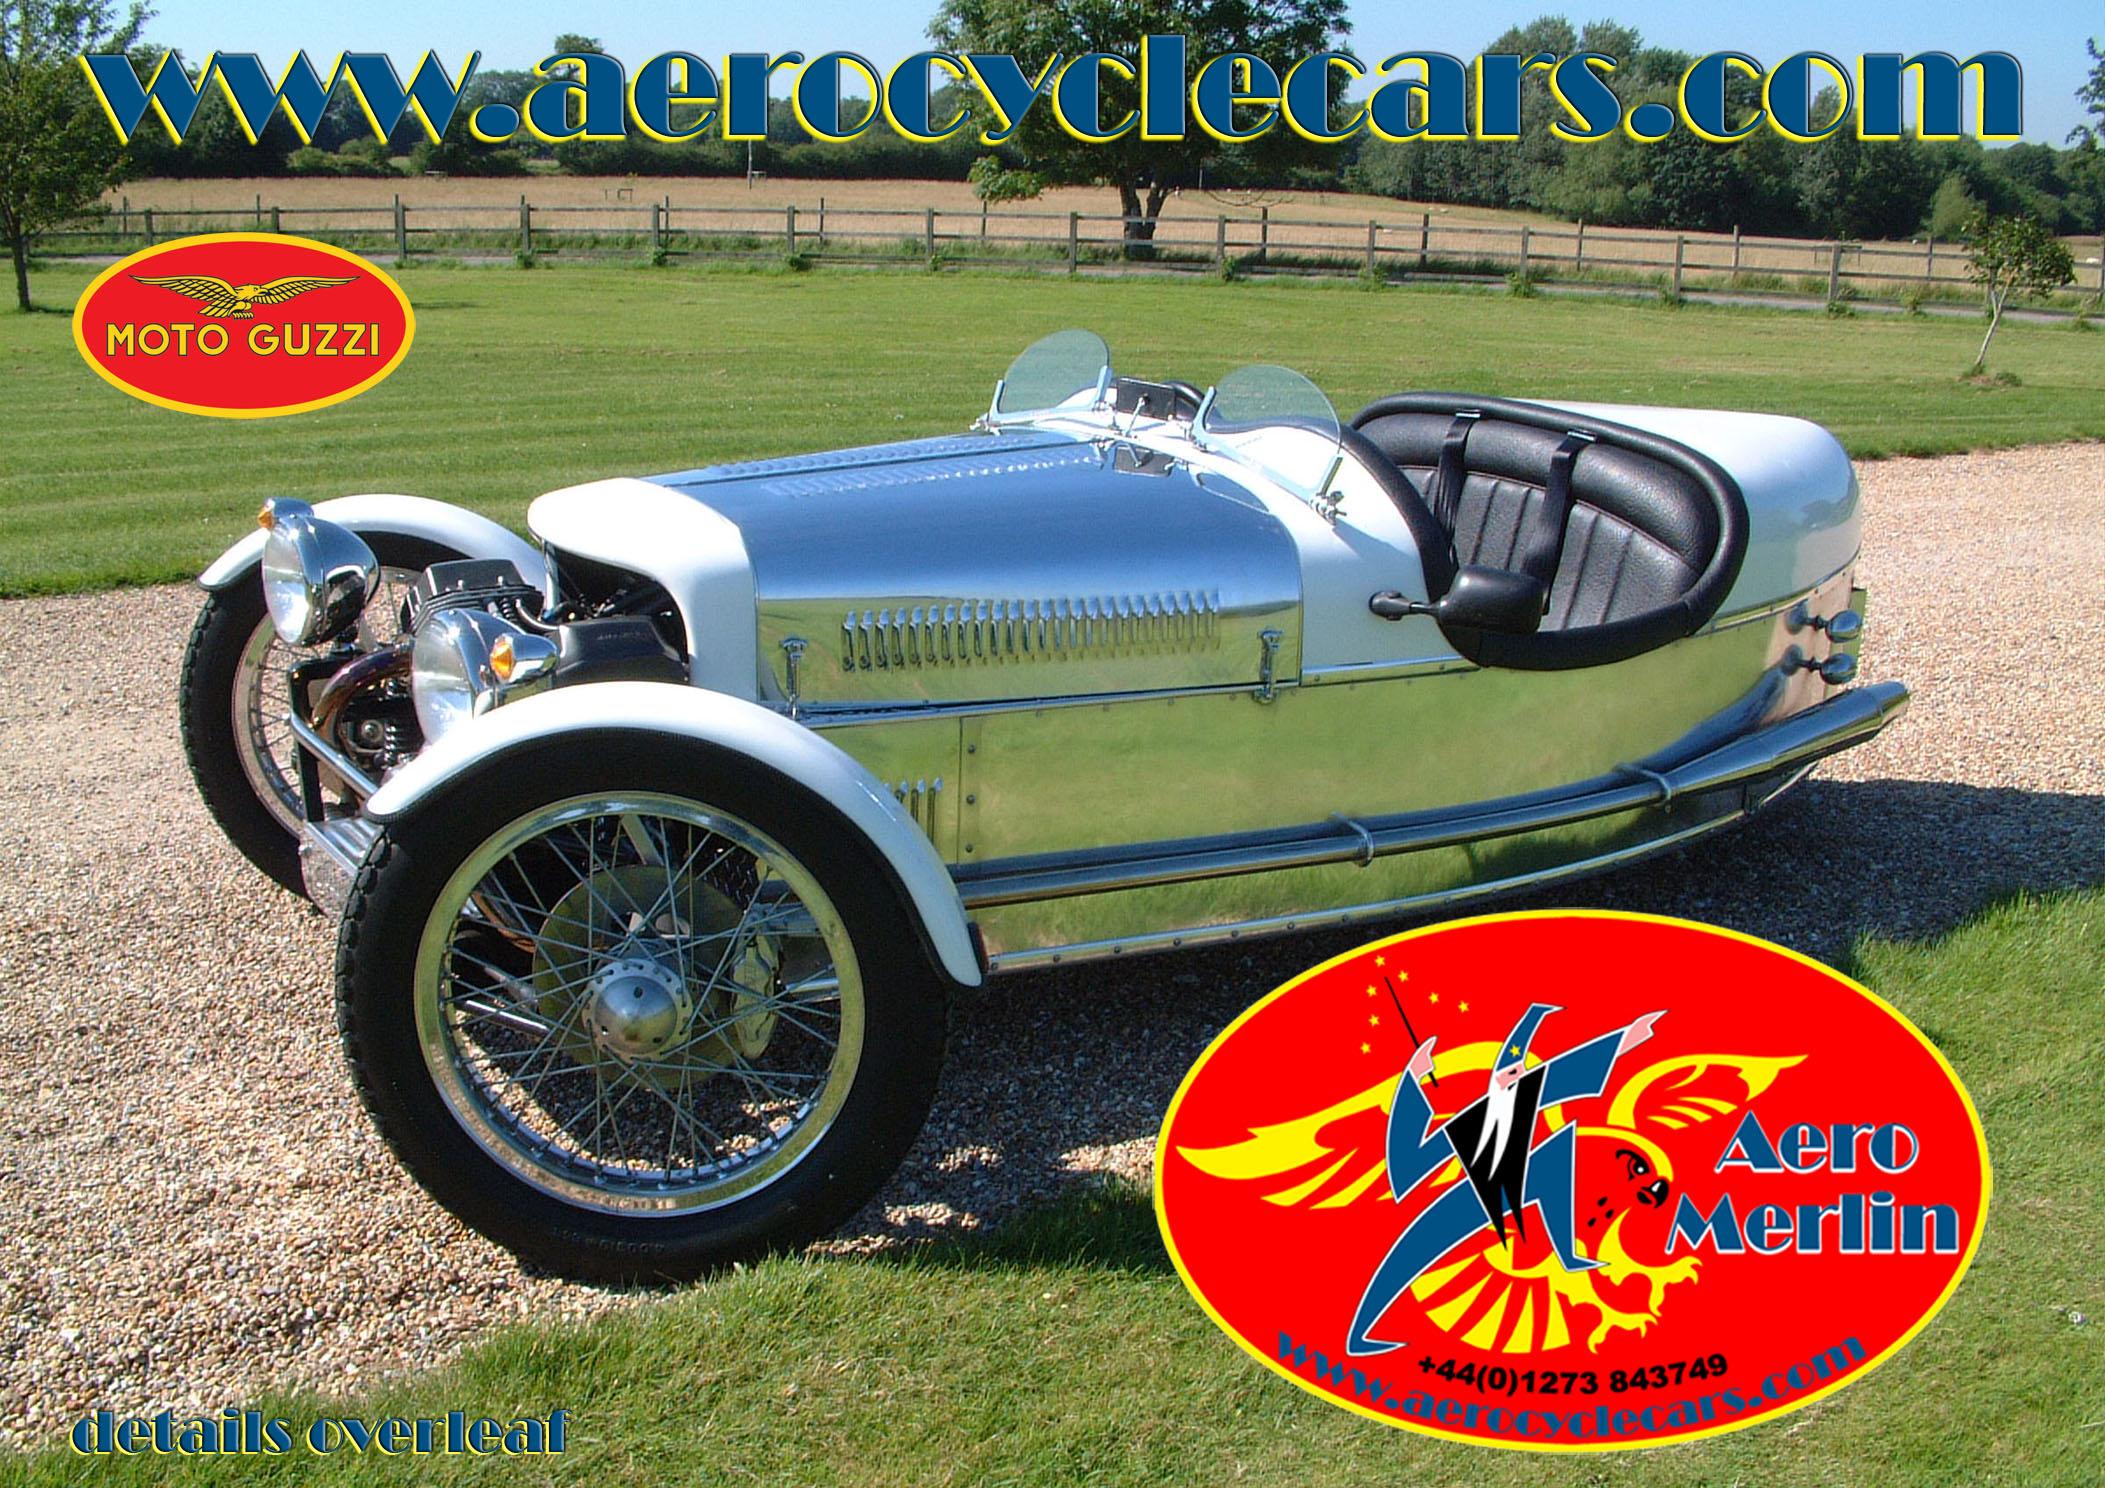 Morgan replica three wheelers,aero cycle cars,